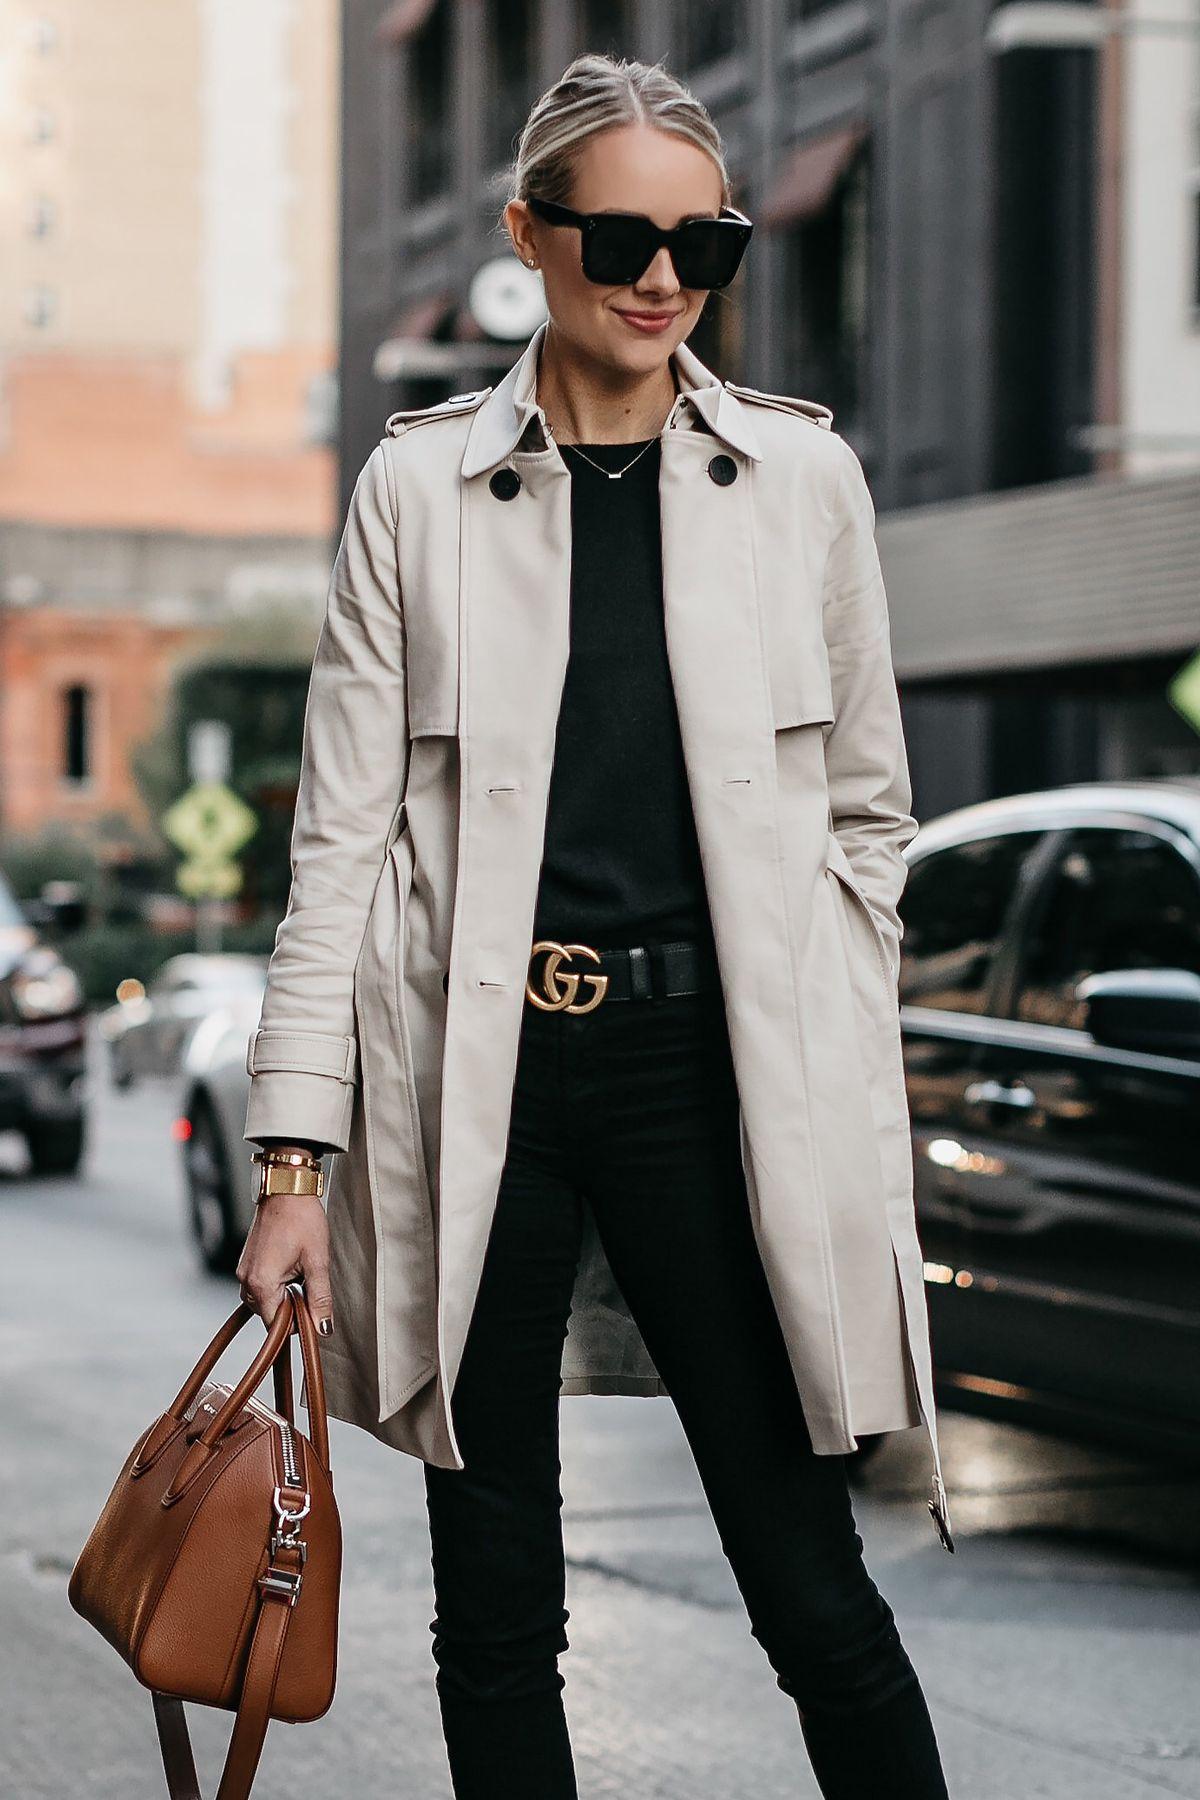 8140aecd5b2d8 Blonde Woman Wearing Club Monaco Trench Coat Black Sweater Black Skinny  Jeans Gucci Marmont Belt Givenchy Antigona Cognac Satchel Fashion Jackson  Dallas ...